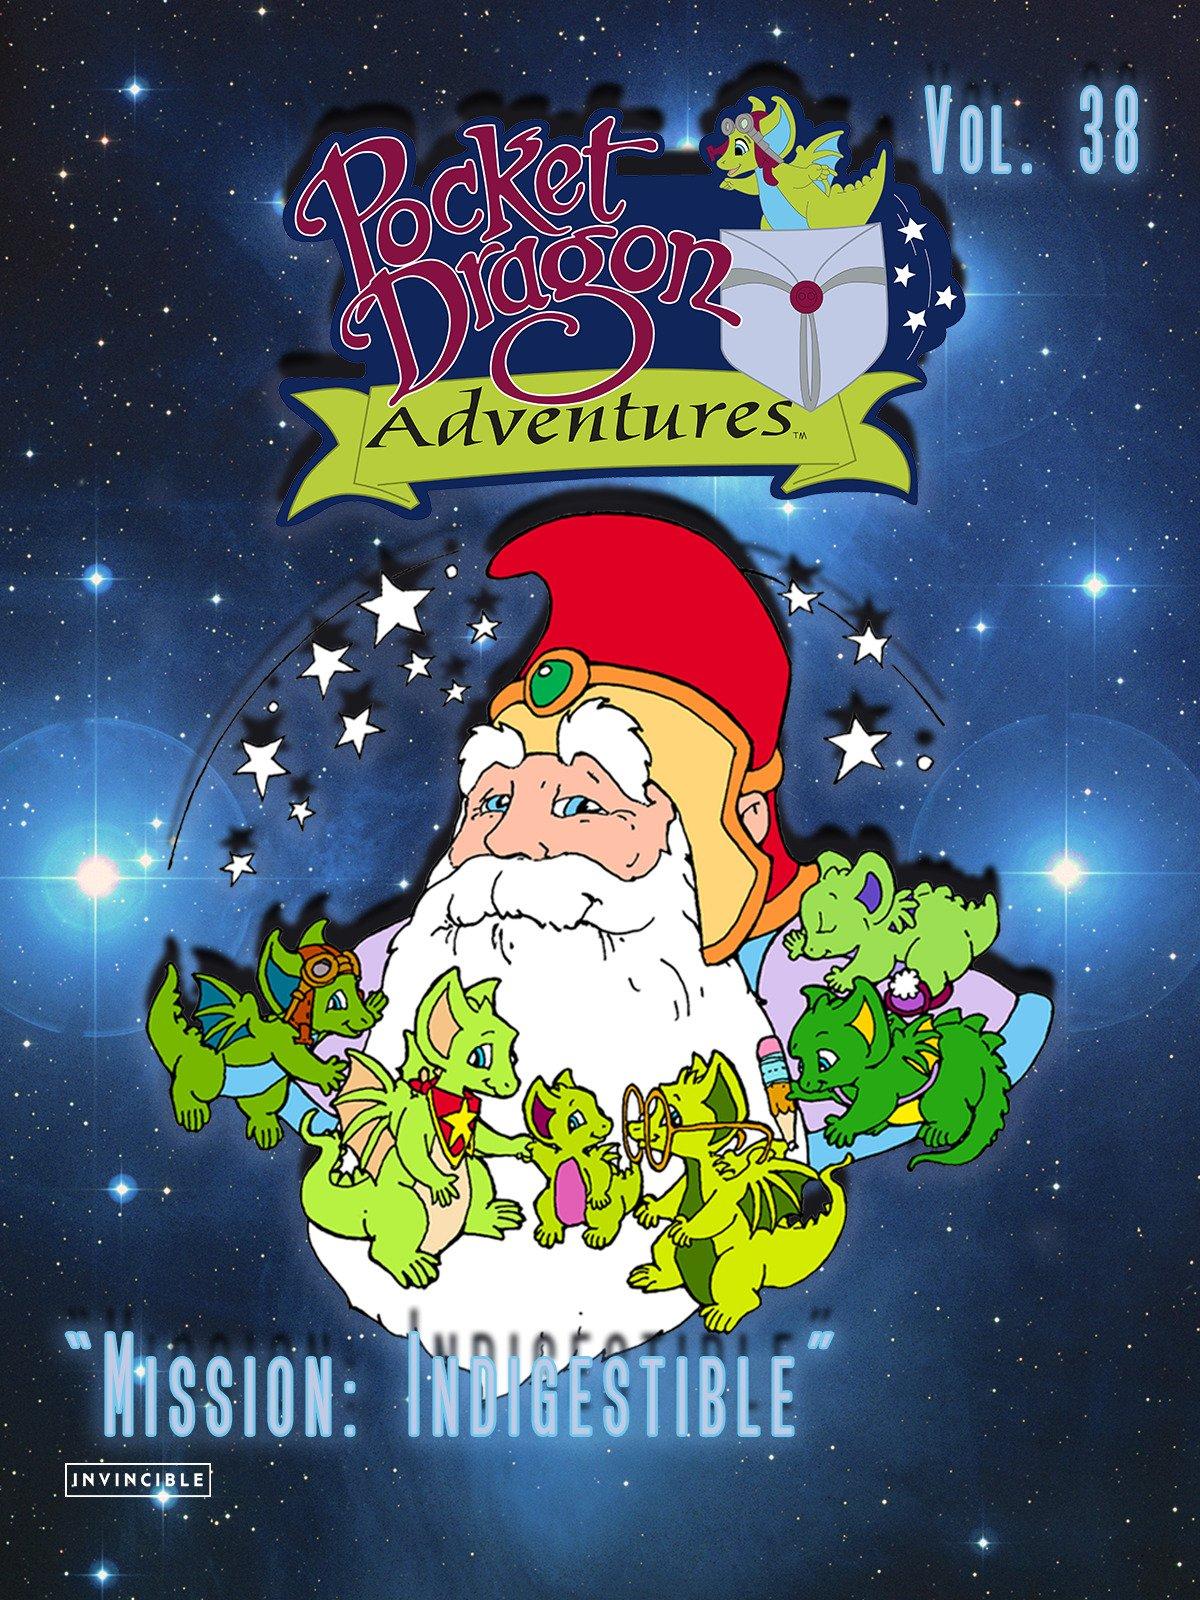 Pocket Dragon Adventures Vol. 38Mission: Indigestible